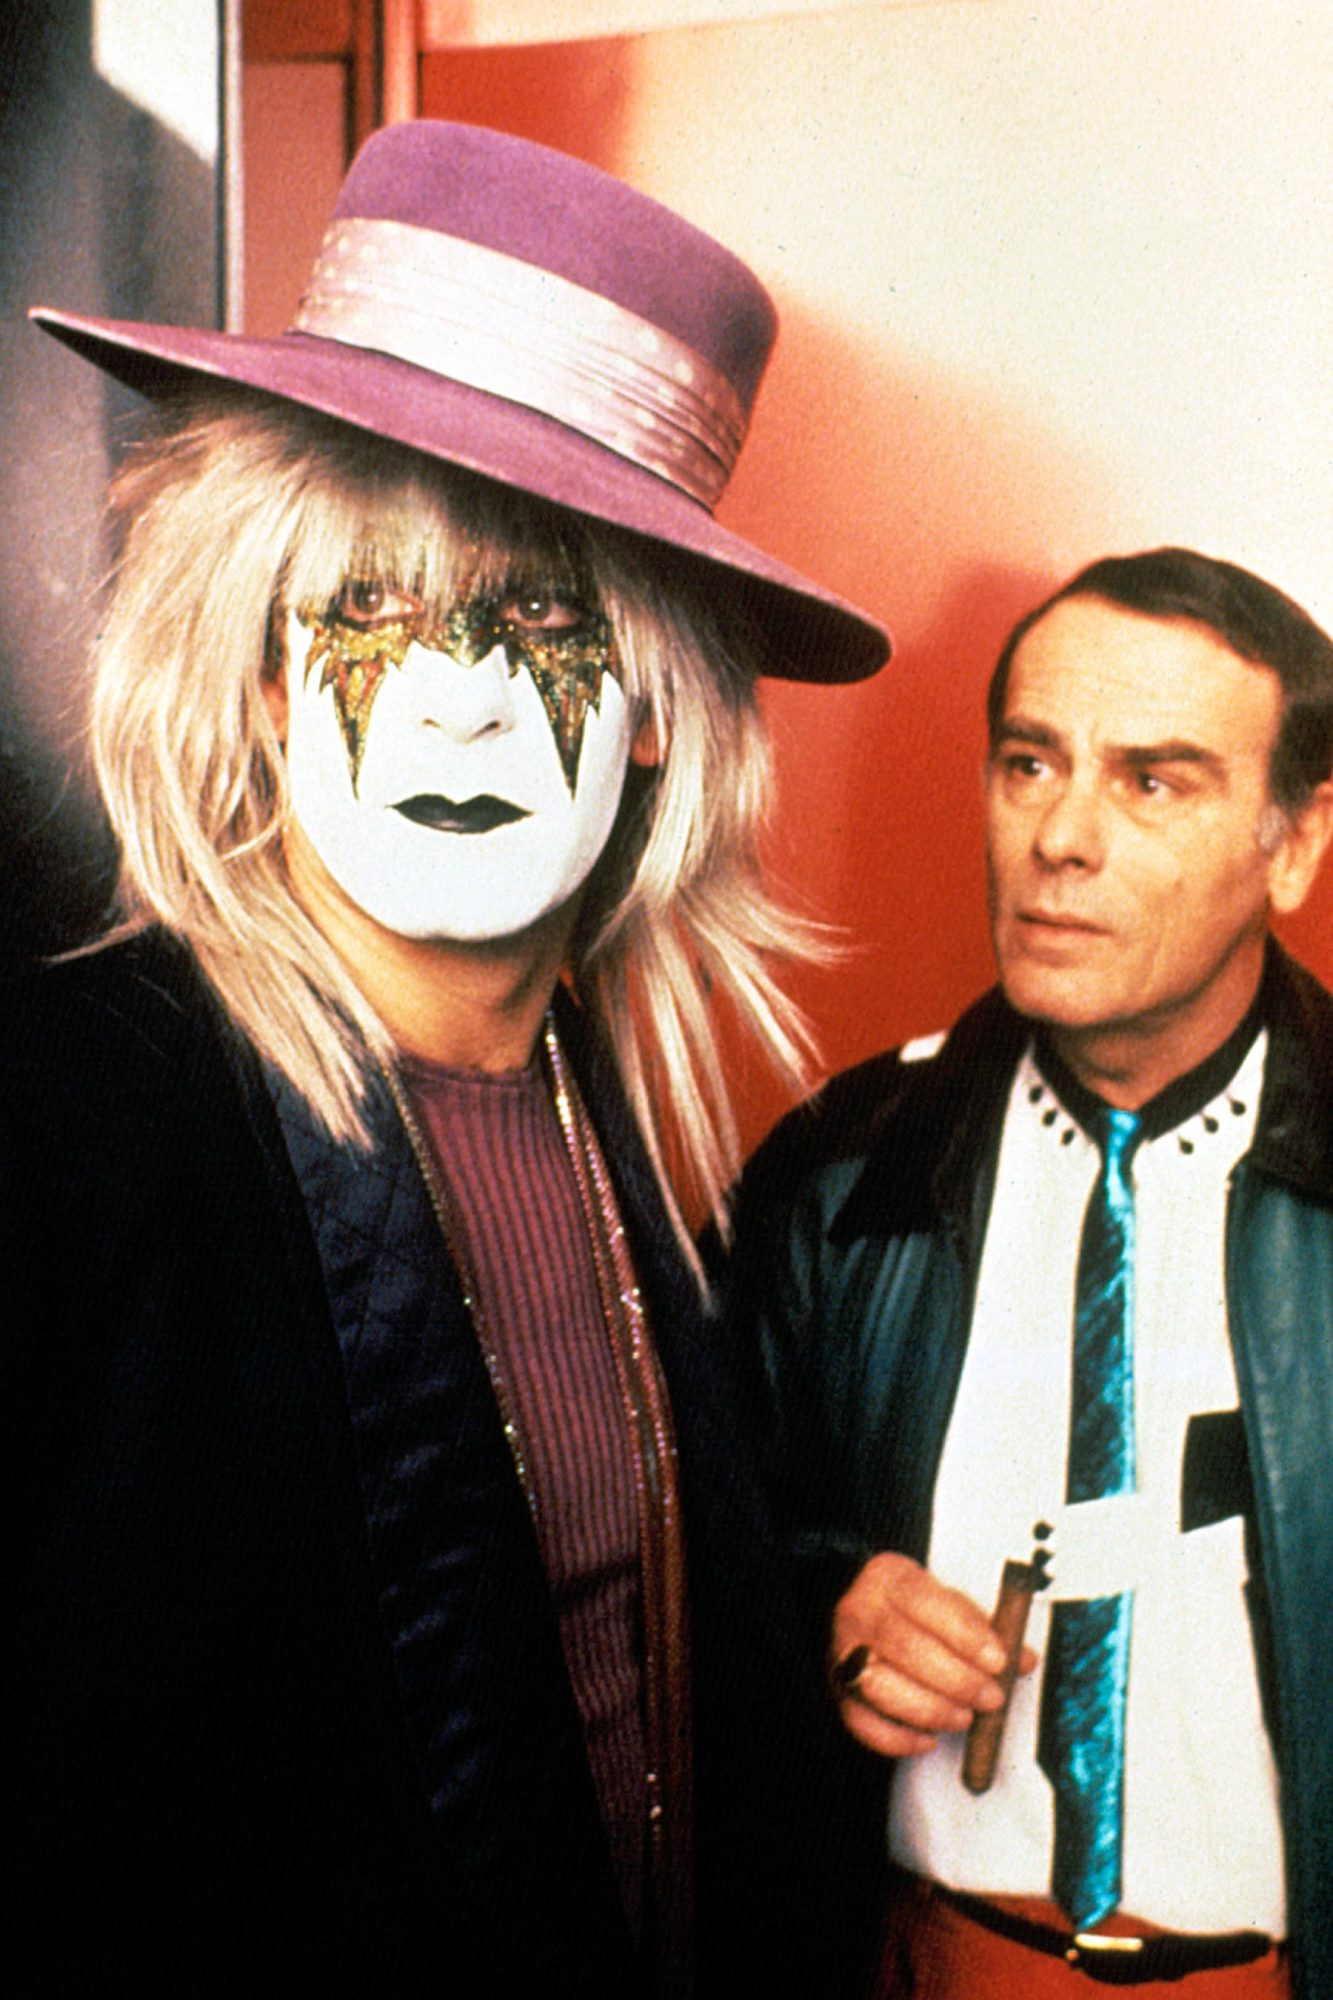 QUANTUM LEAP, Scott Bakula, Dean Stockwell, 1989-93, episode 'Glitter Rock-April 12, 1974' aired 4/1